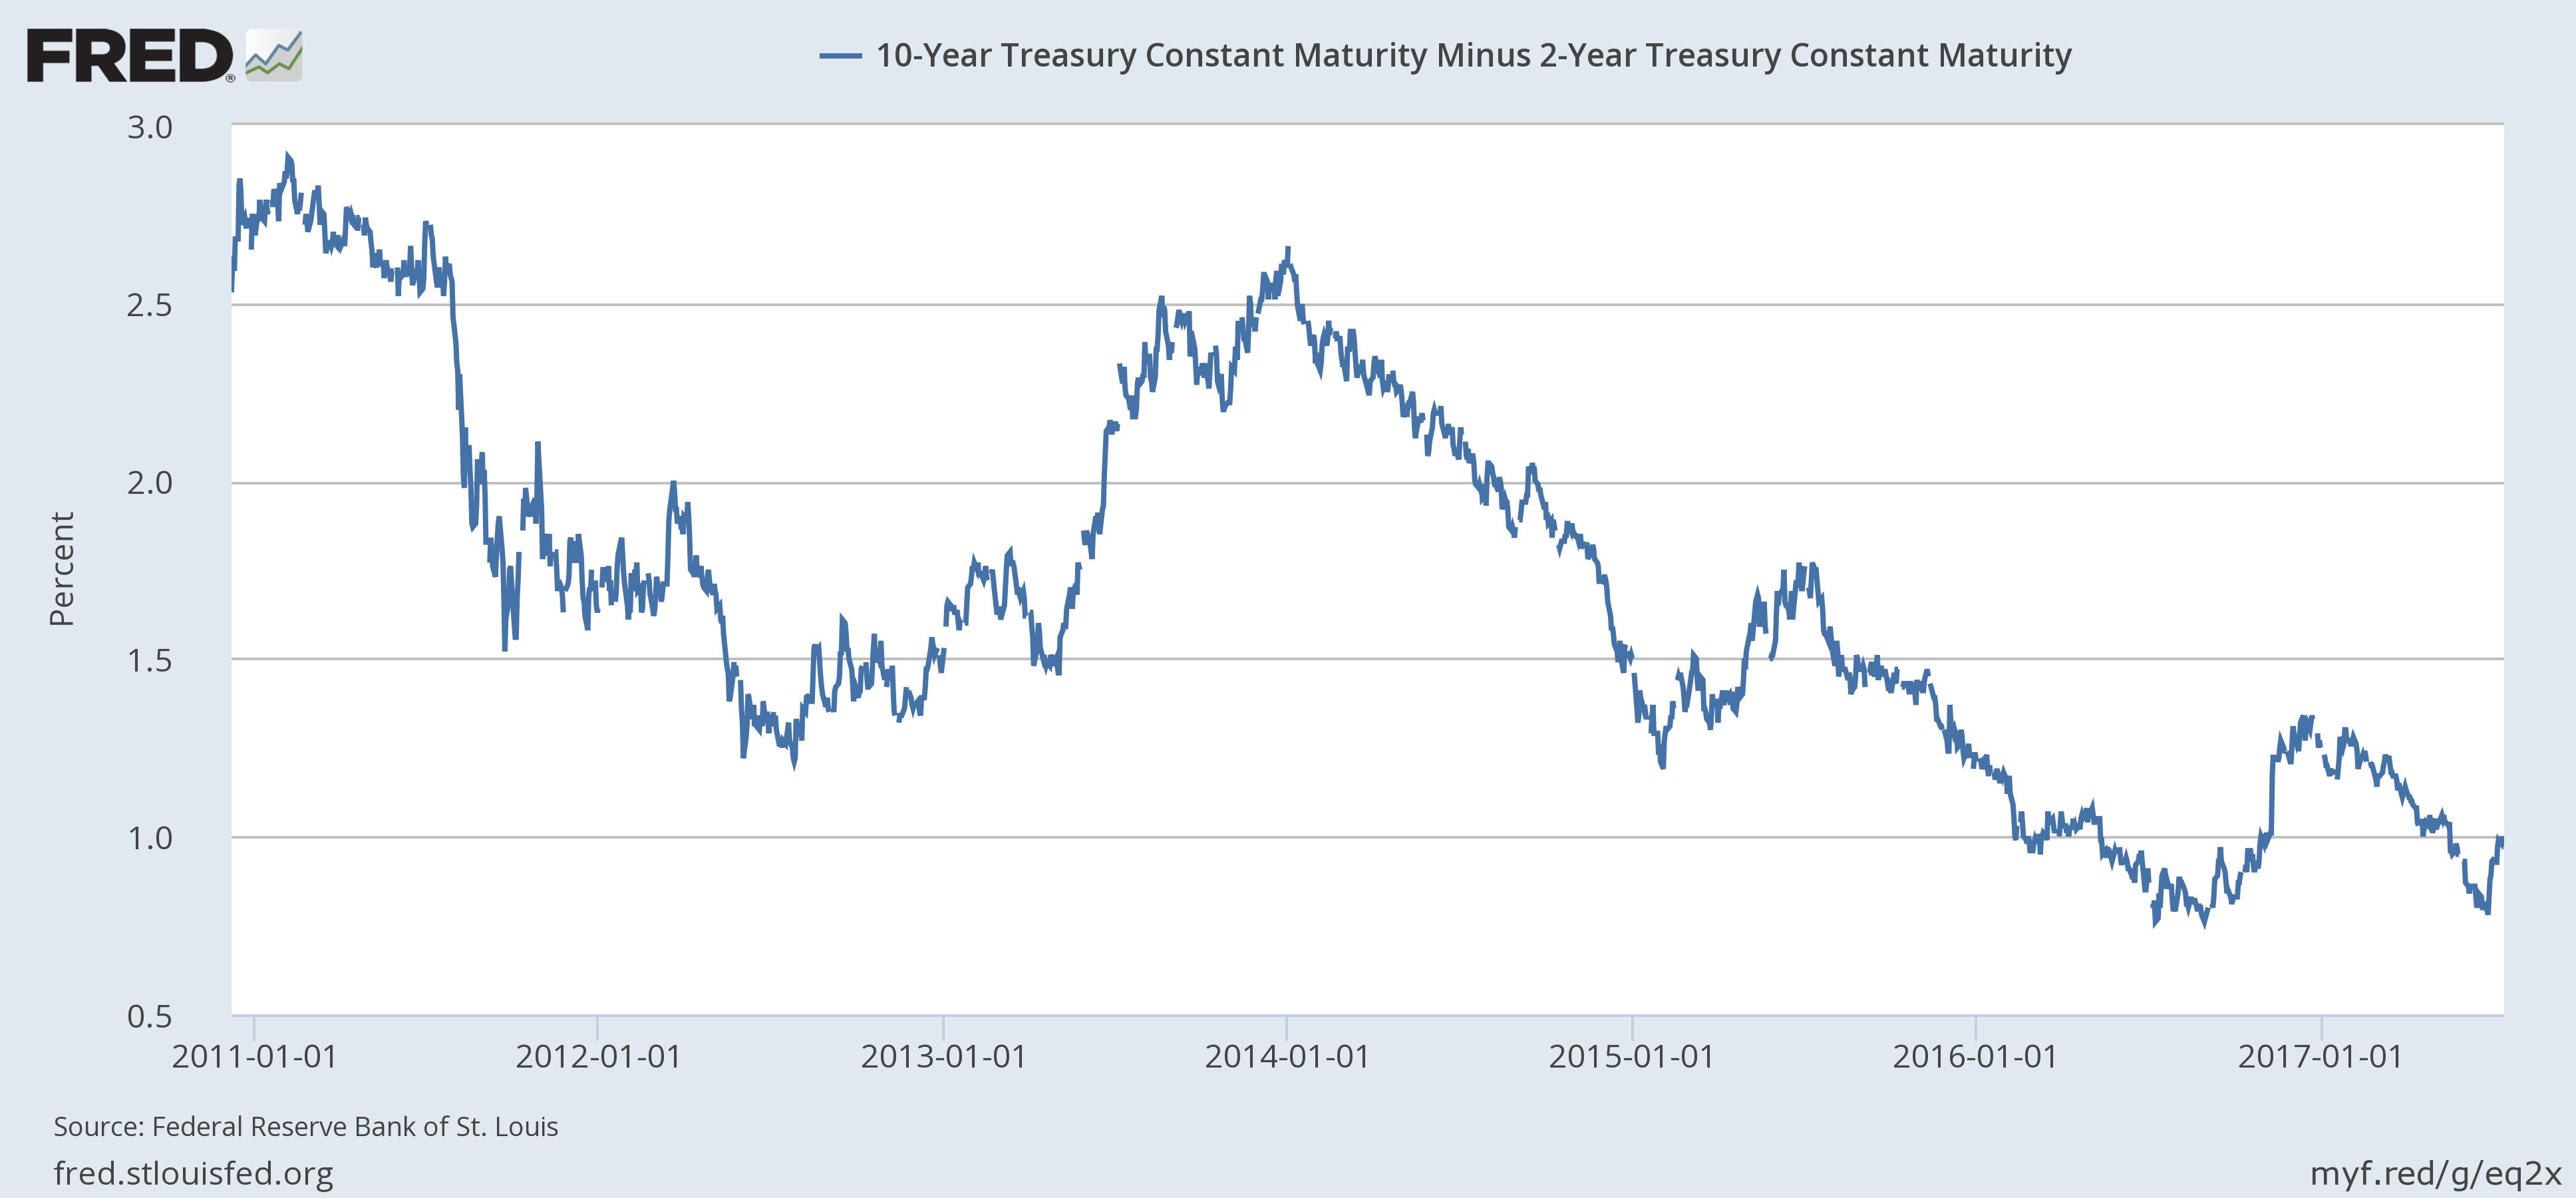 US 10 Year Treasury Constant Maturity minus 2 Year Treasury, 1990 - 2017